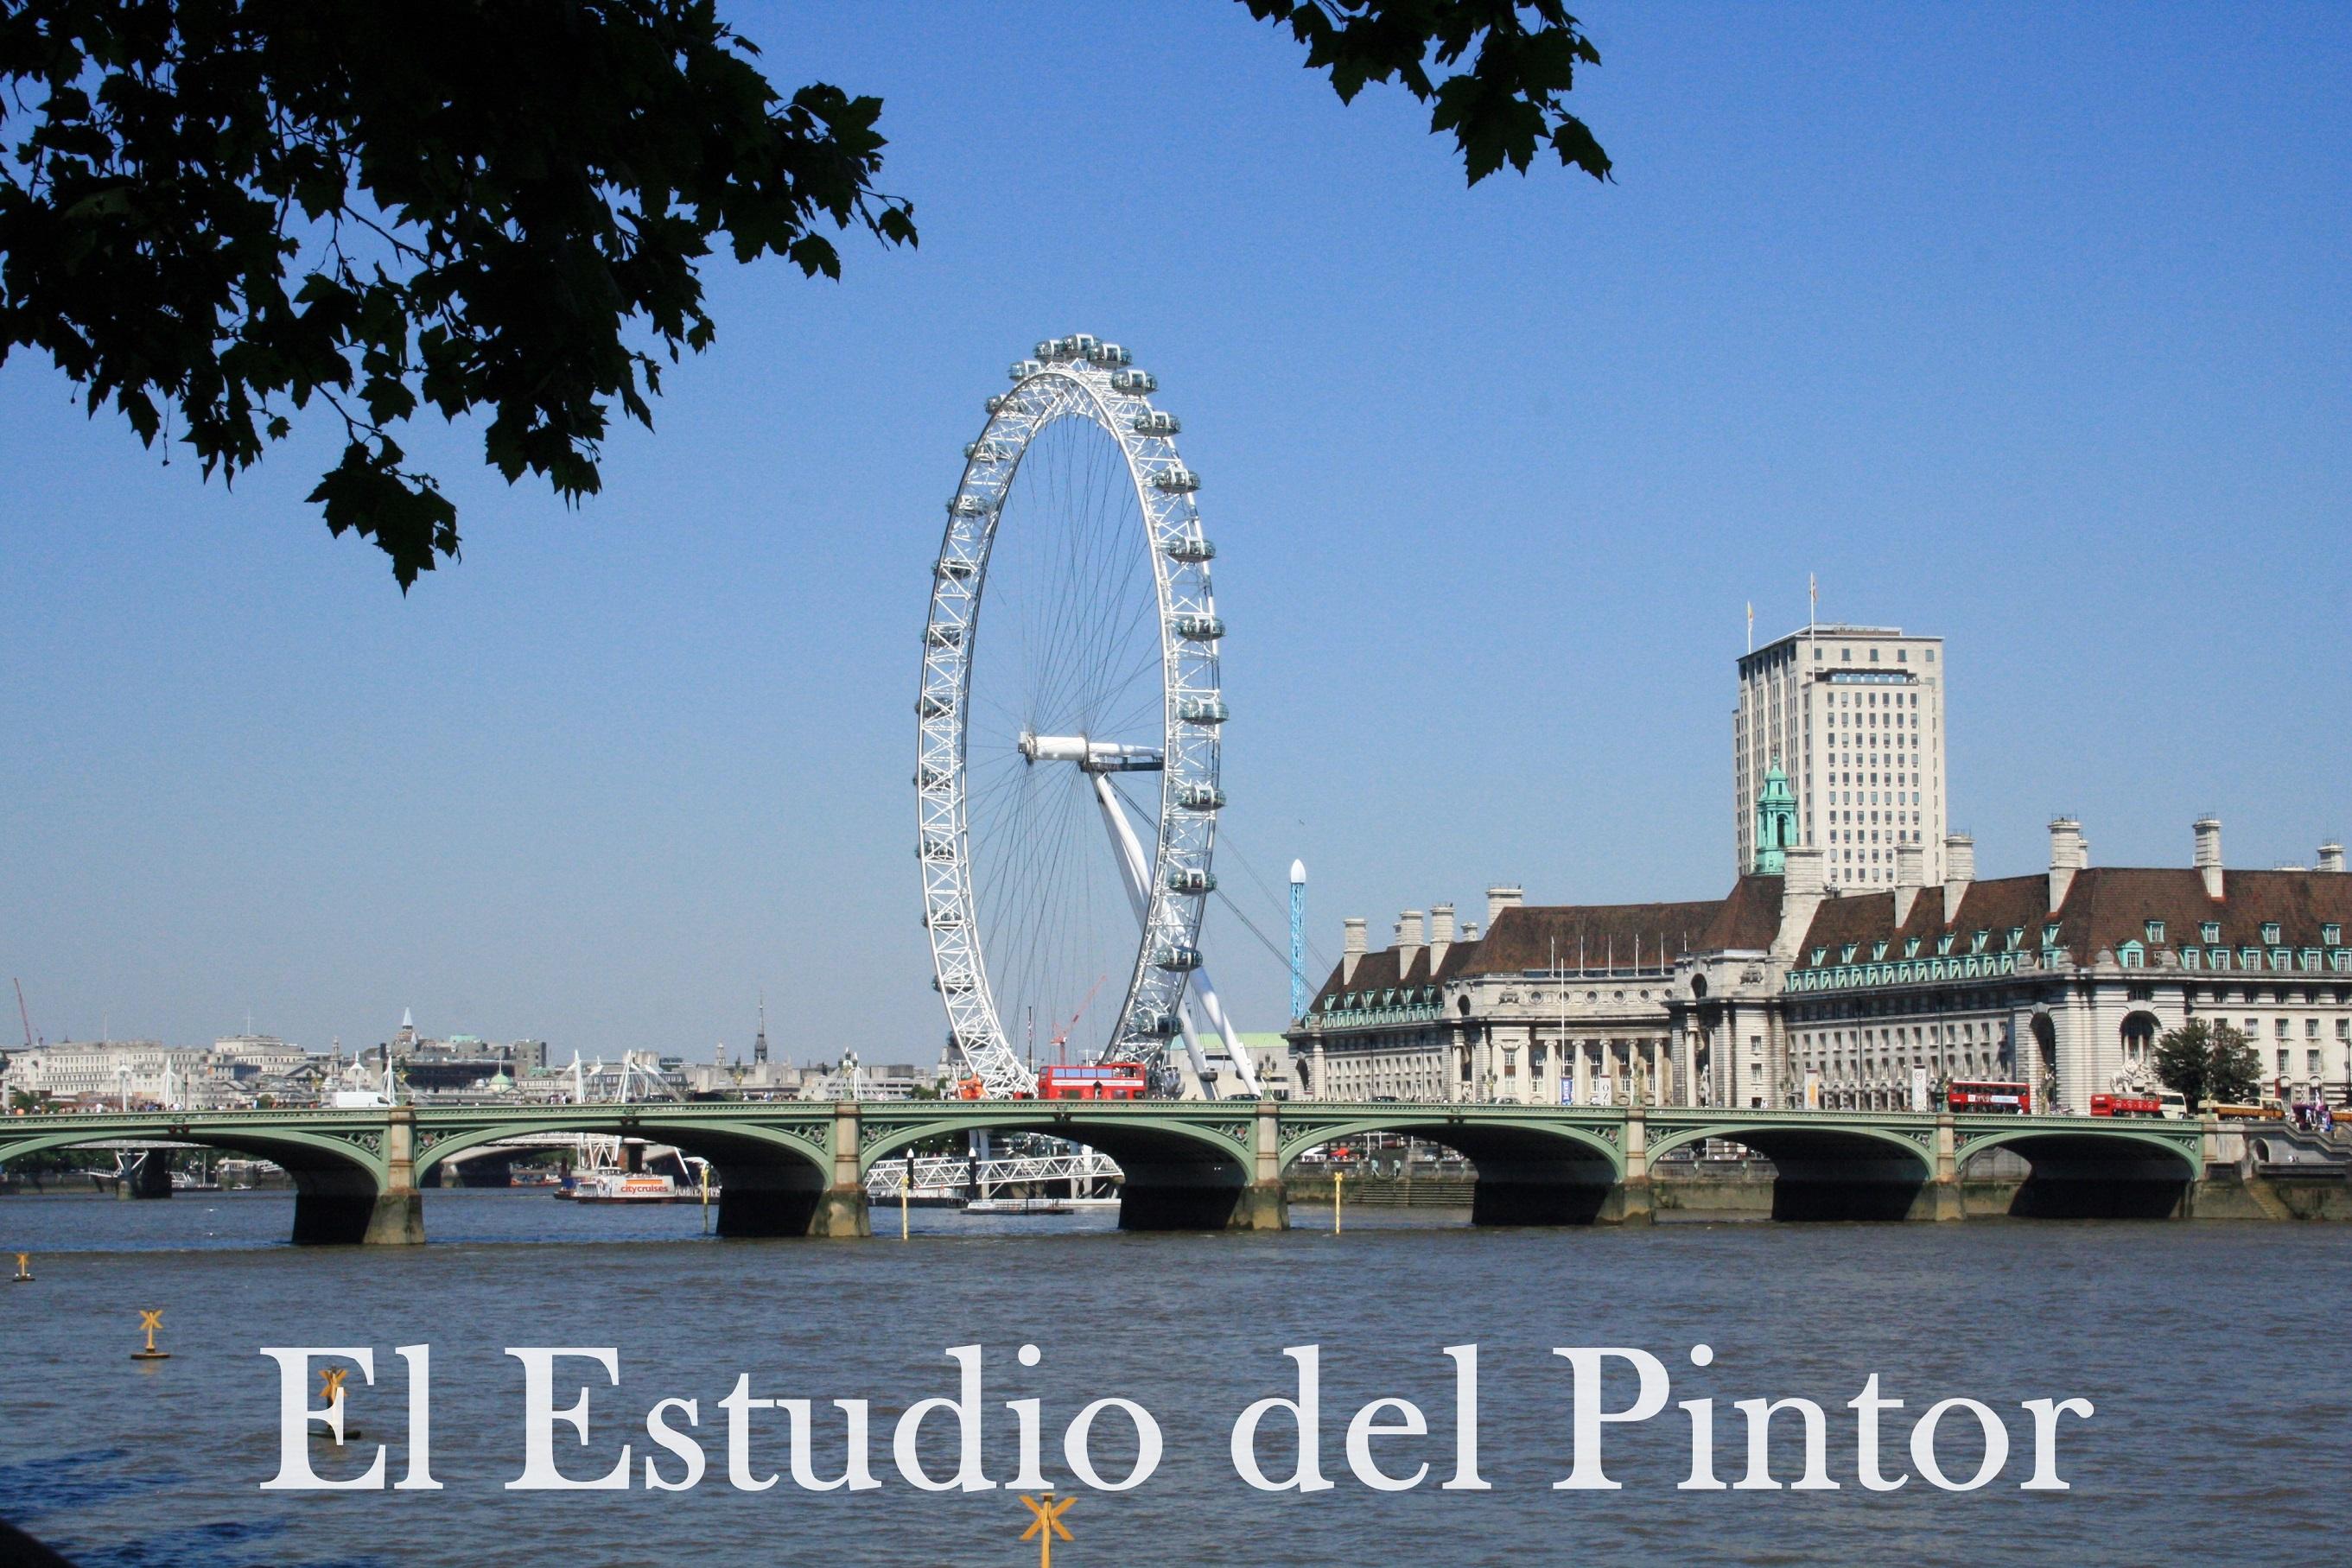 5. London Eye